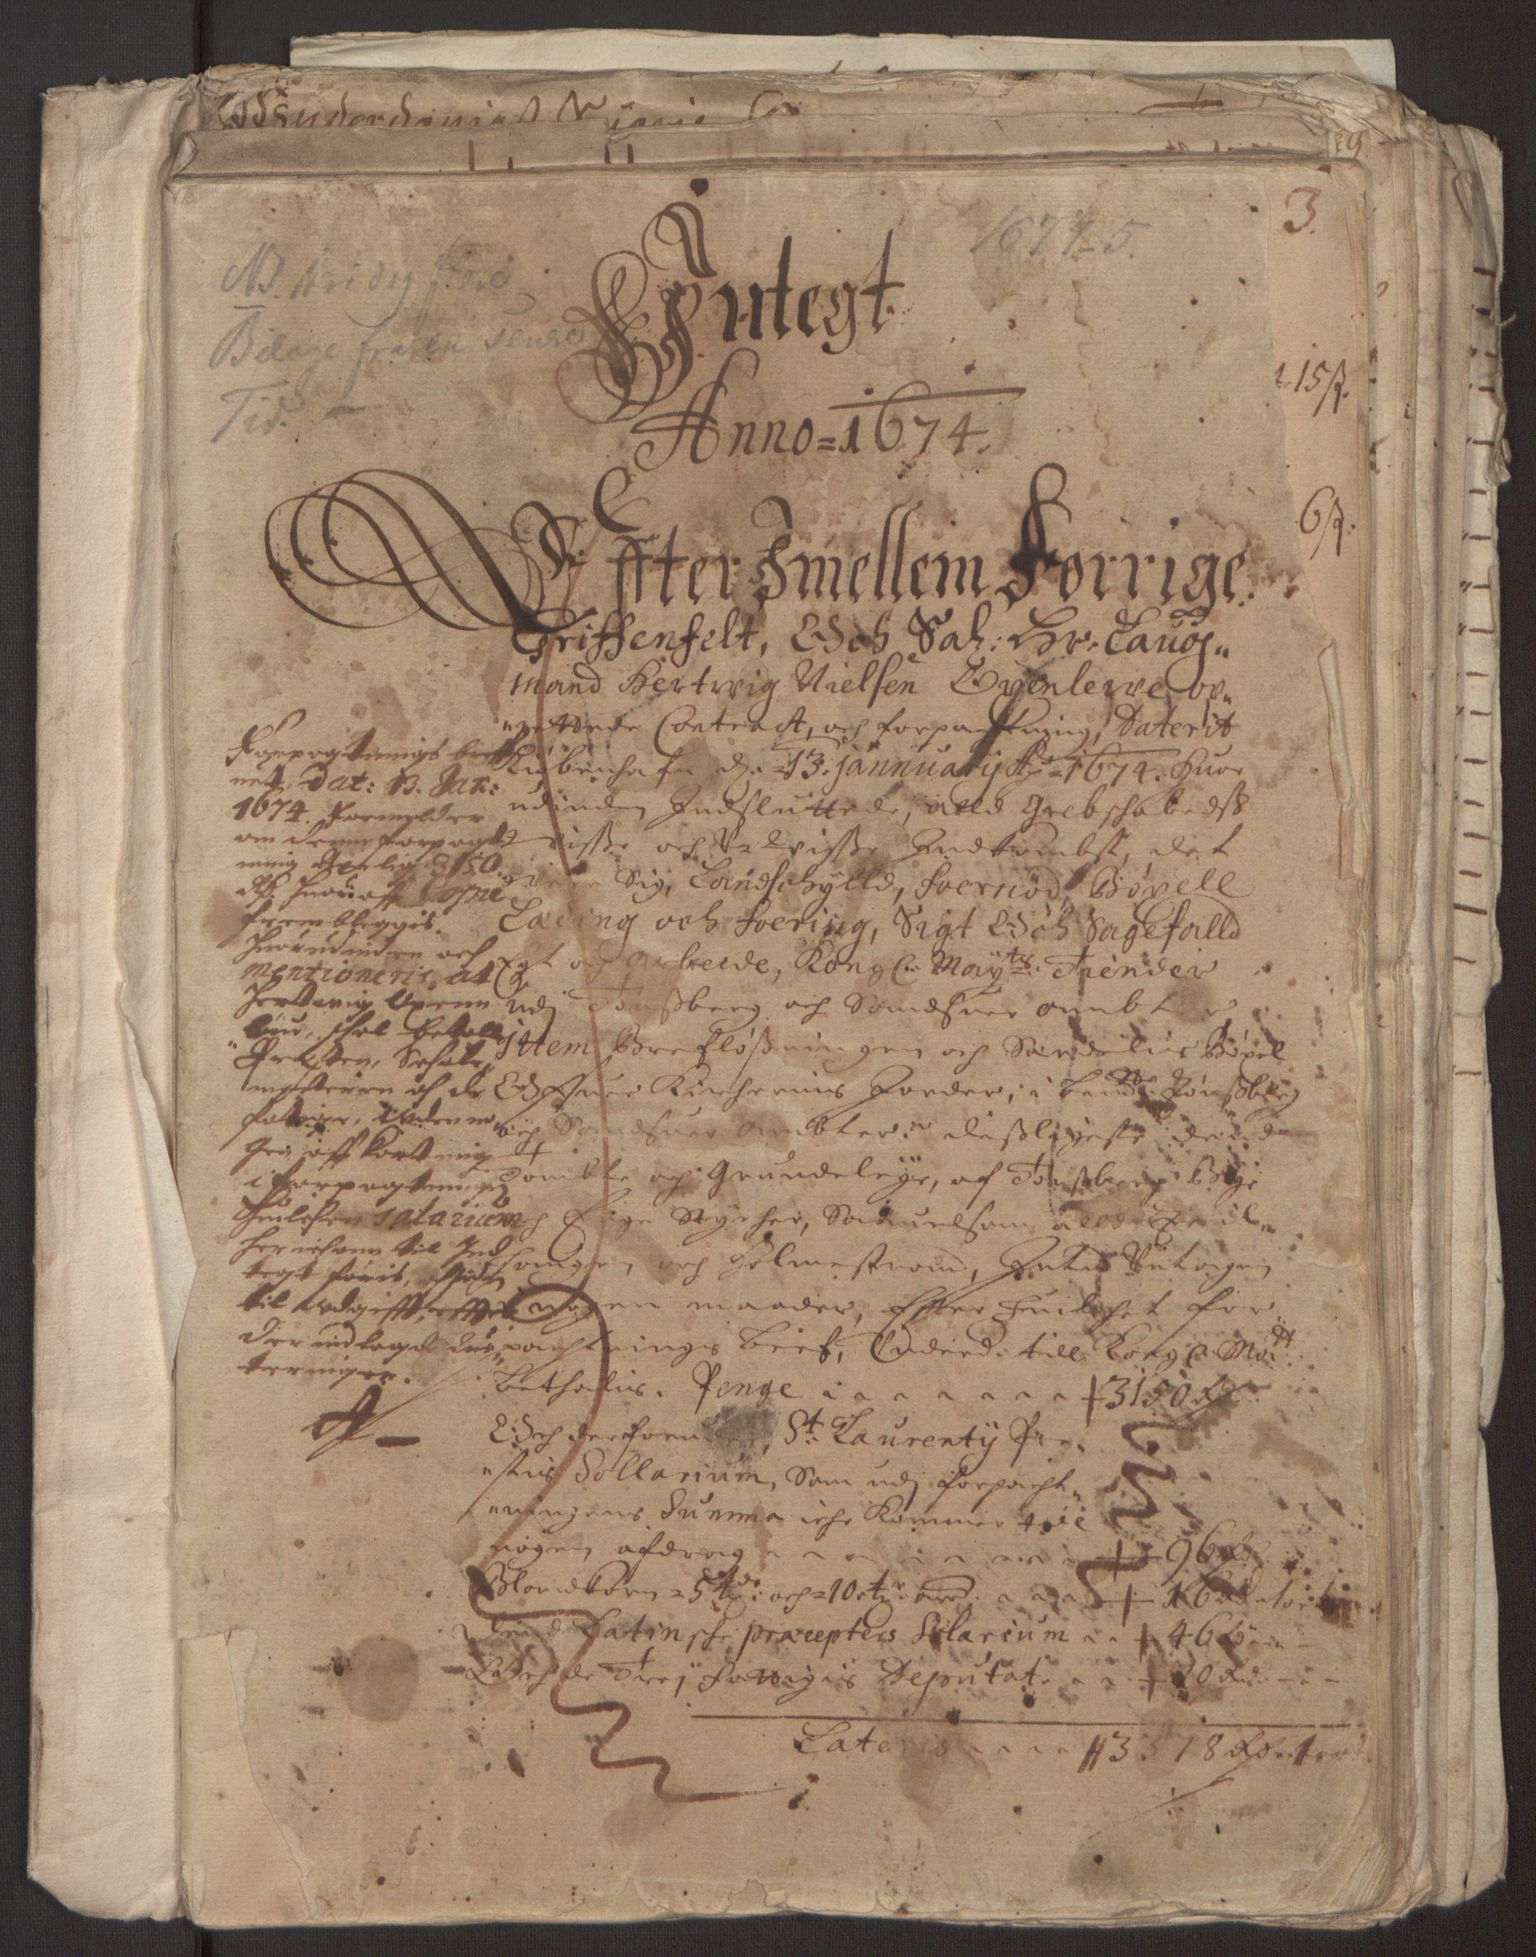 RA, Rentekammeret inntil 1814, Reviderte regnskaper, Fogderegnskap, R32/L1843: Fogderegnskap Jarlsberg grevskap, 1674-1675, s. 3